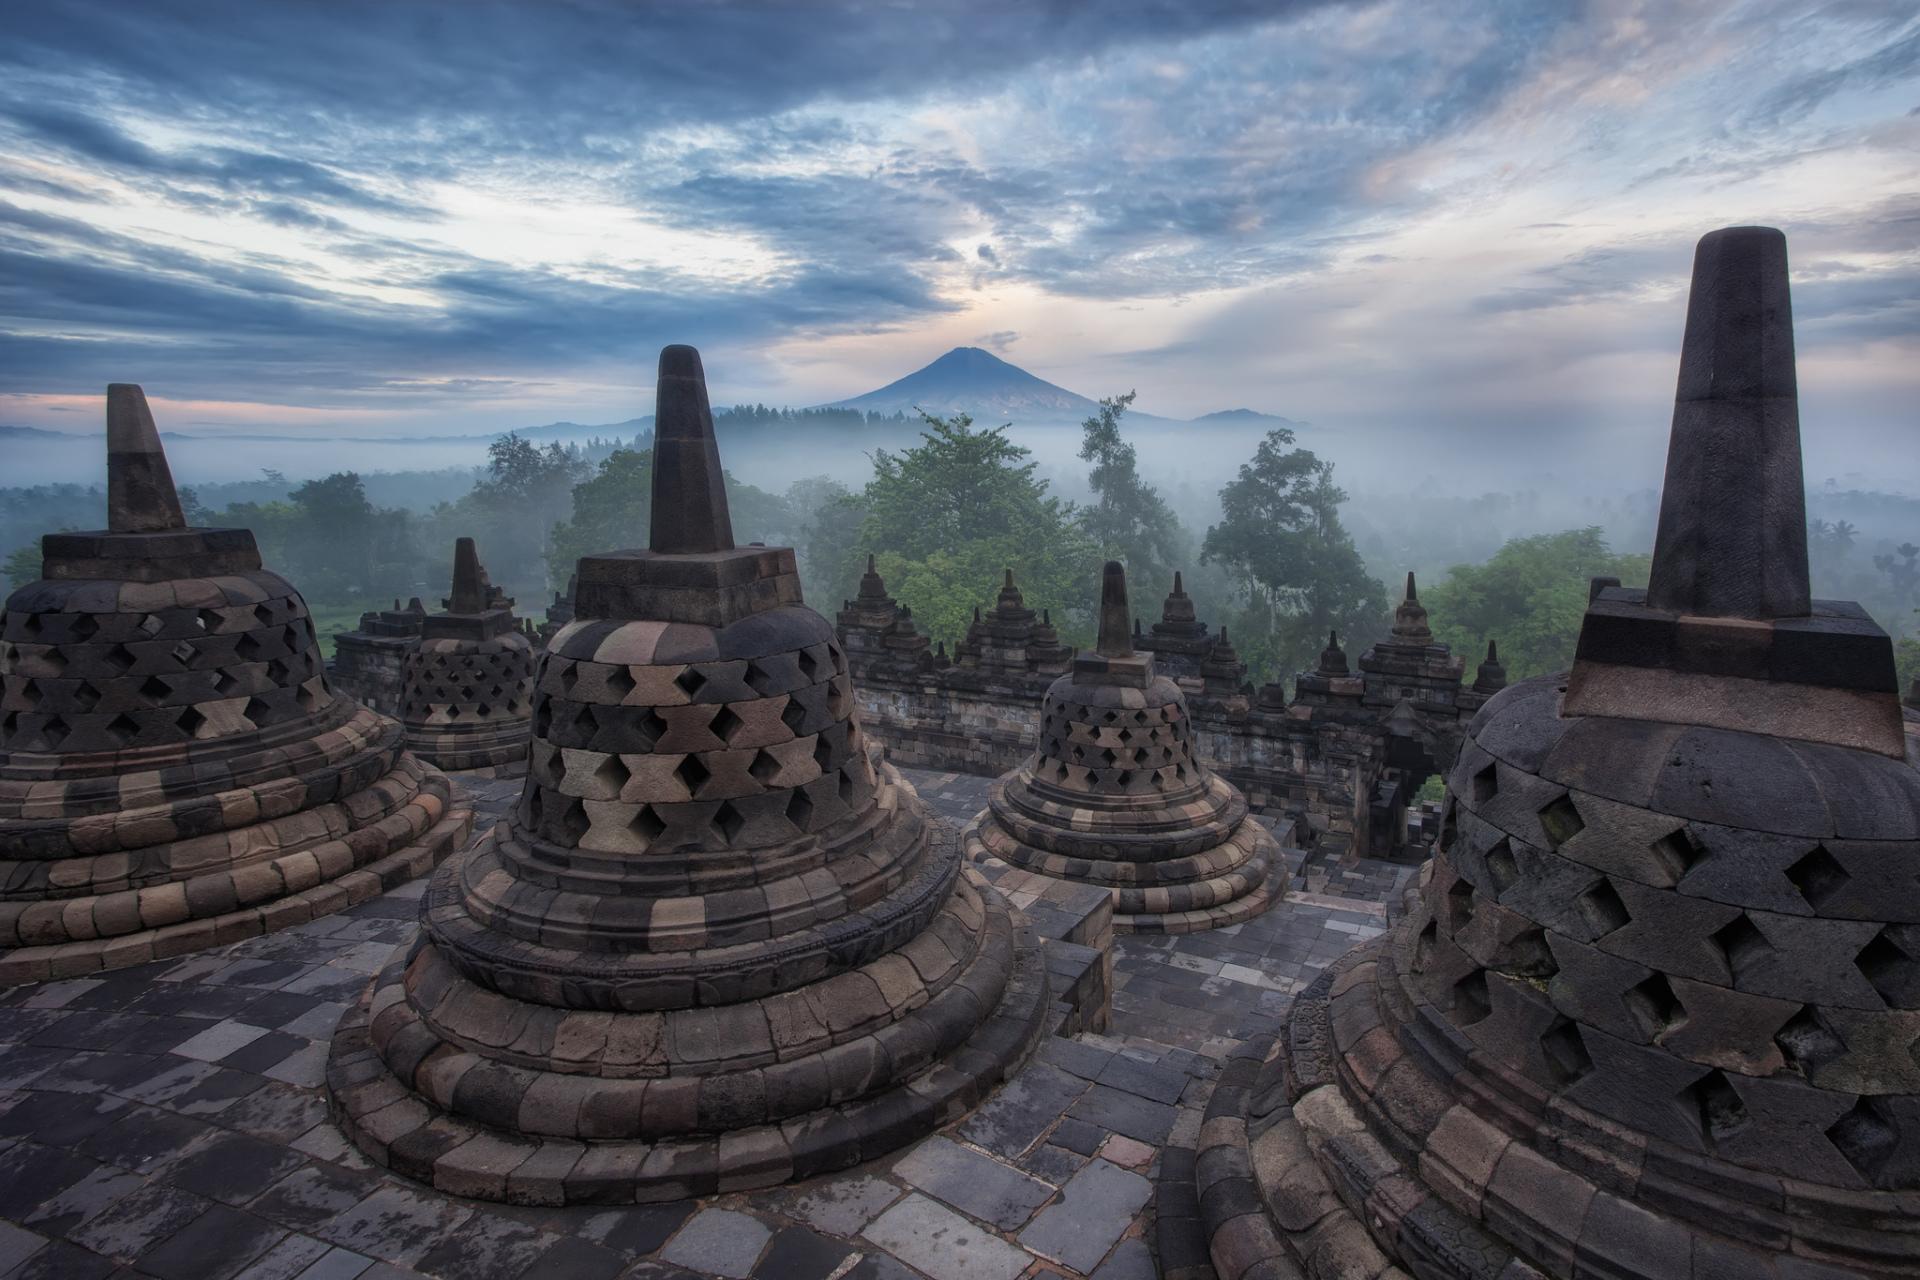 Borobudur wallpapers HD quality